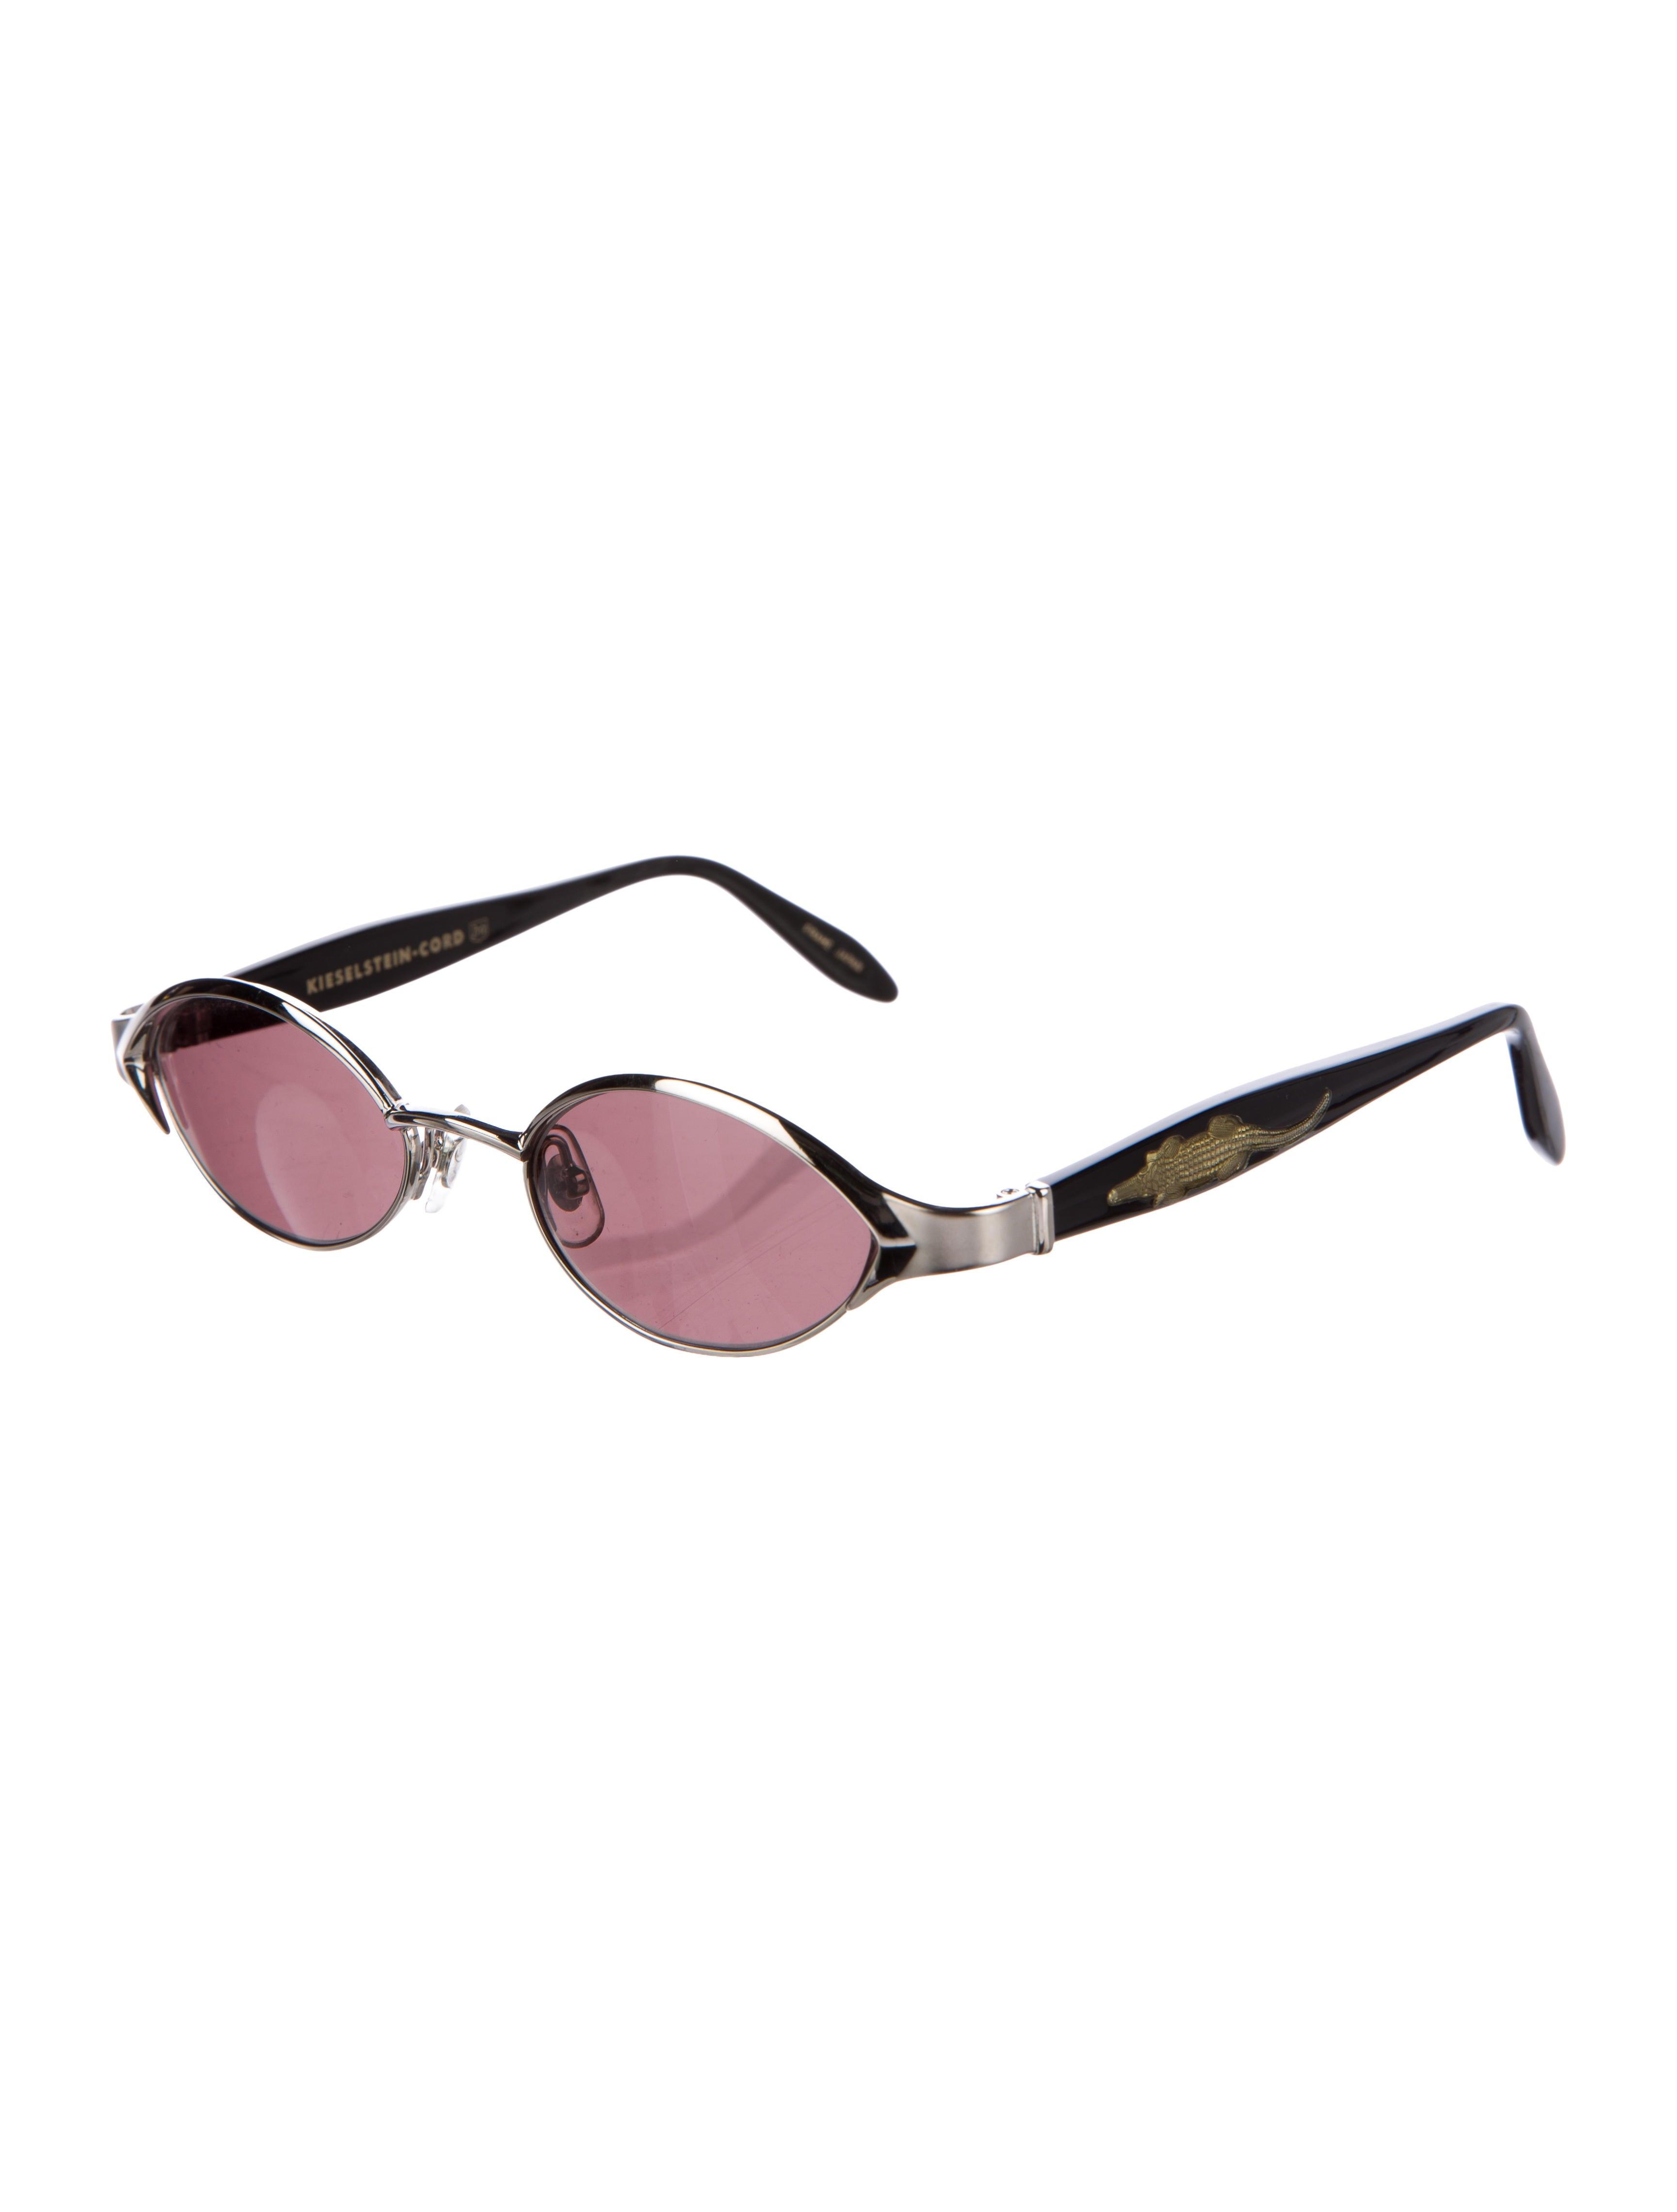 4485915dbd0 Kieselstein Cord Sunglasses Sale - Bitterroot Public Library